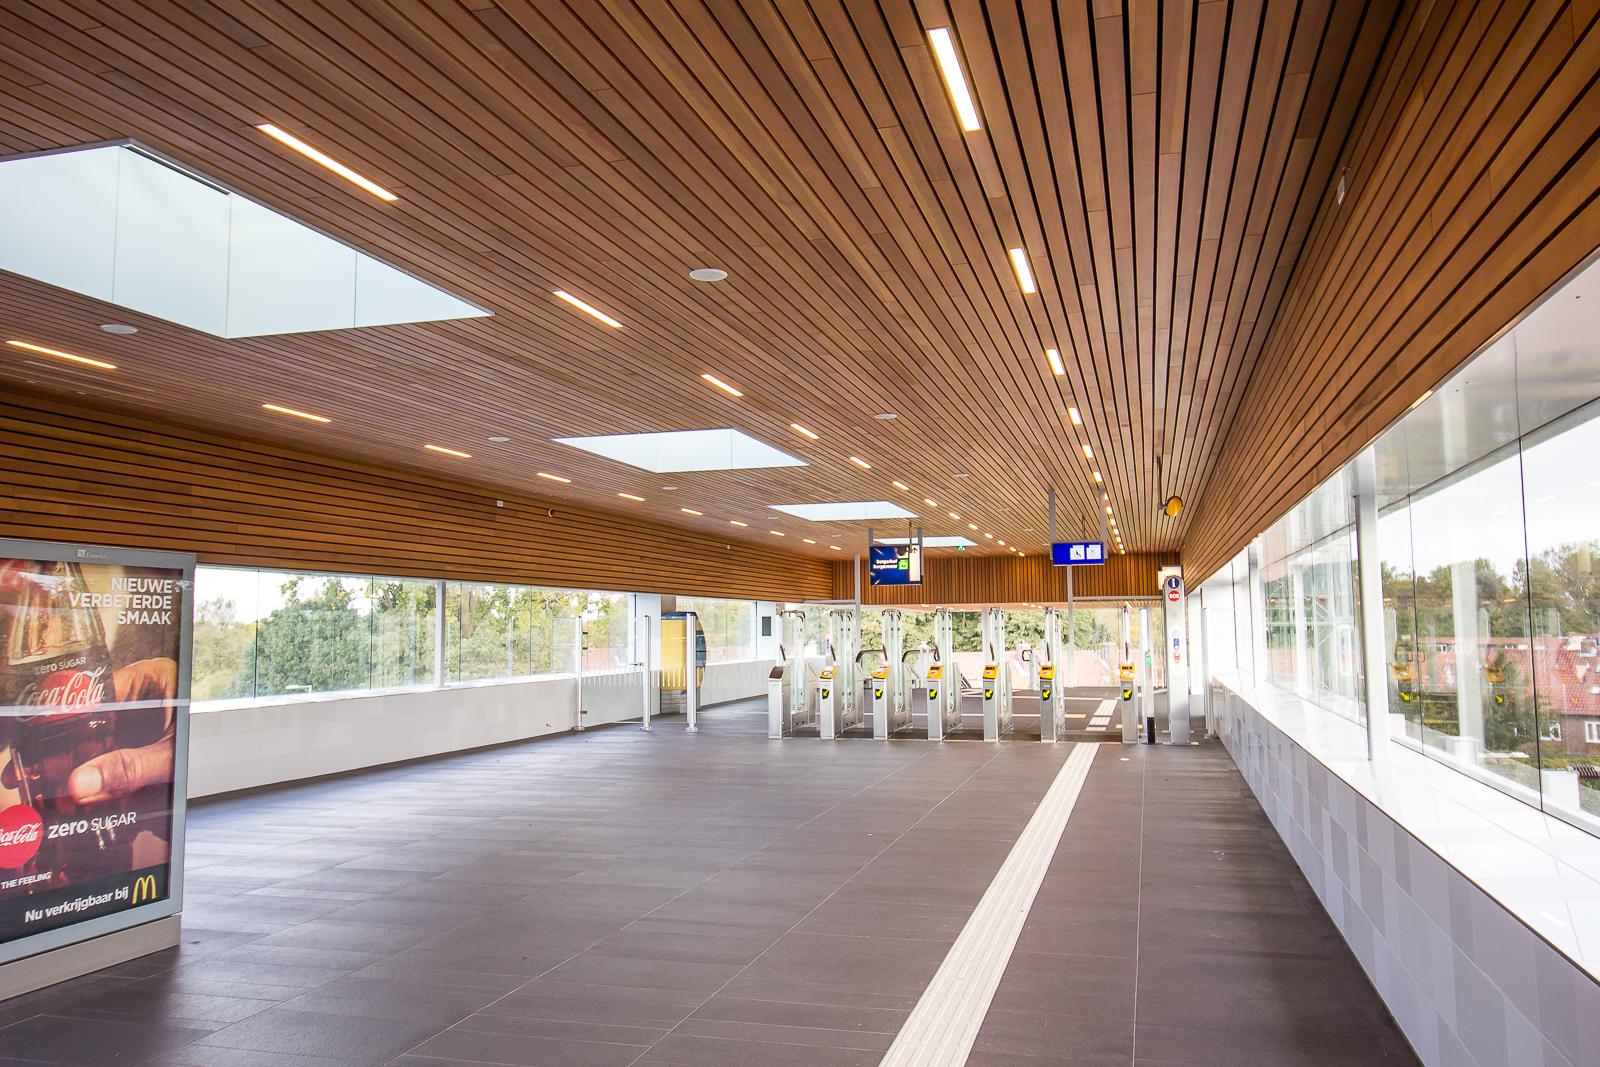 station_alkmaar_2